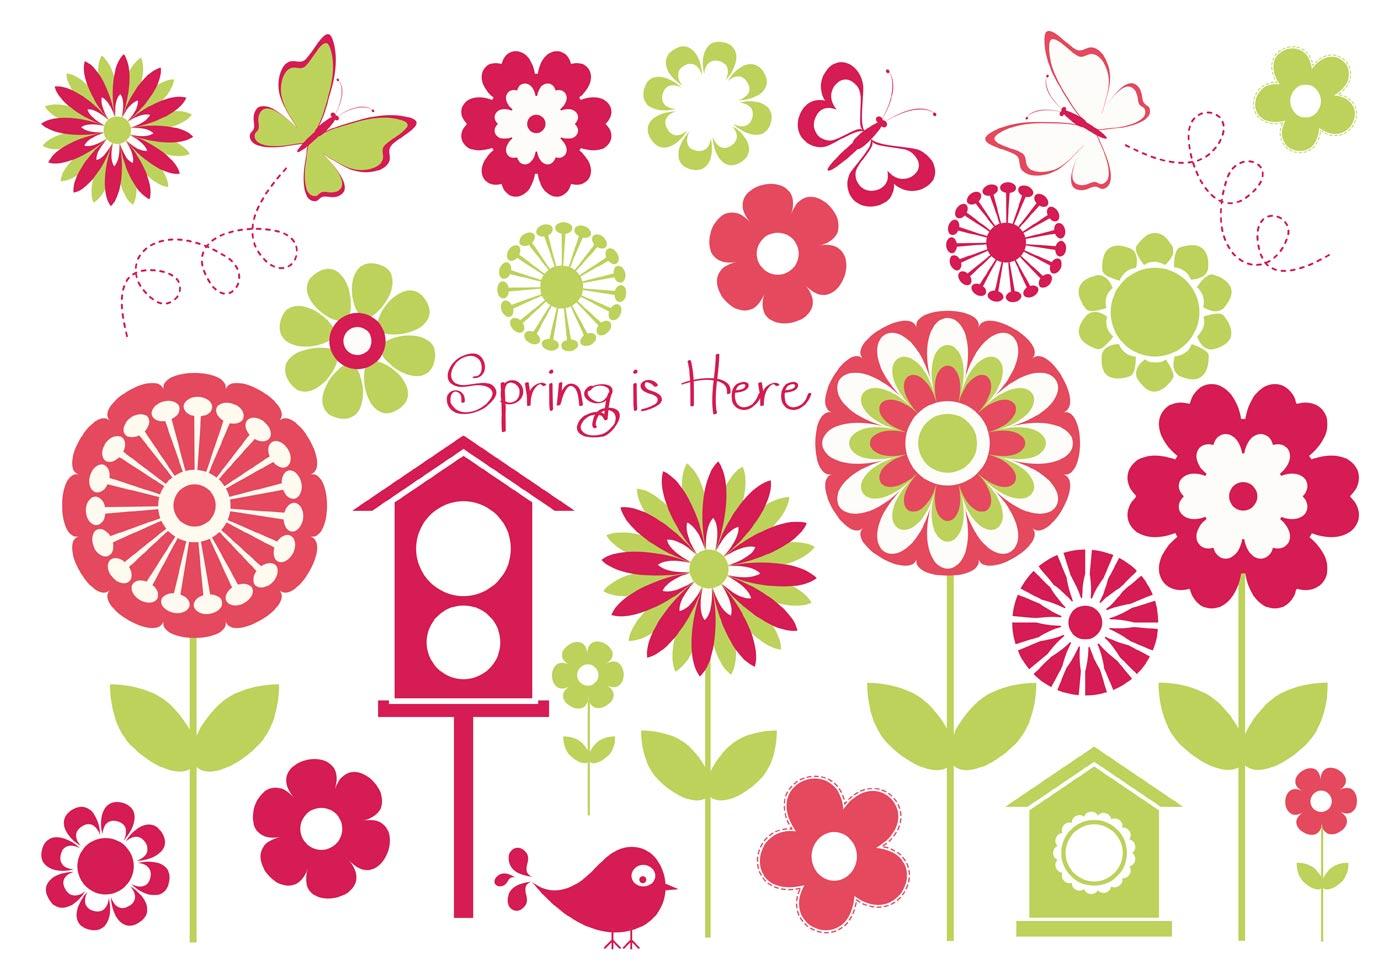 Spring Vector Elements - Download Free Vector Art, Stock ...